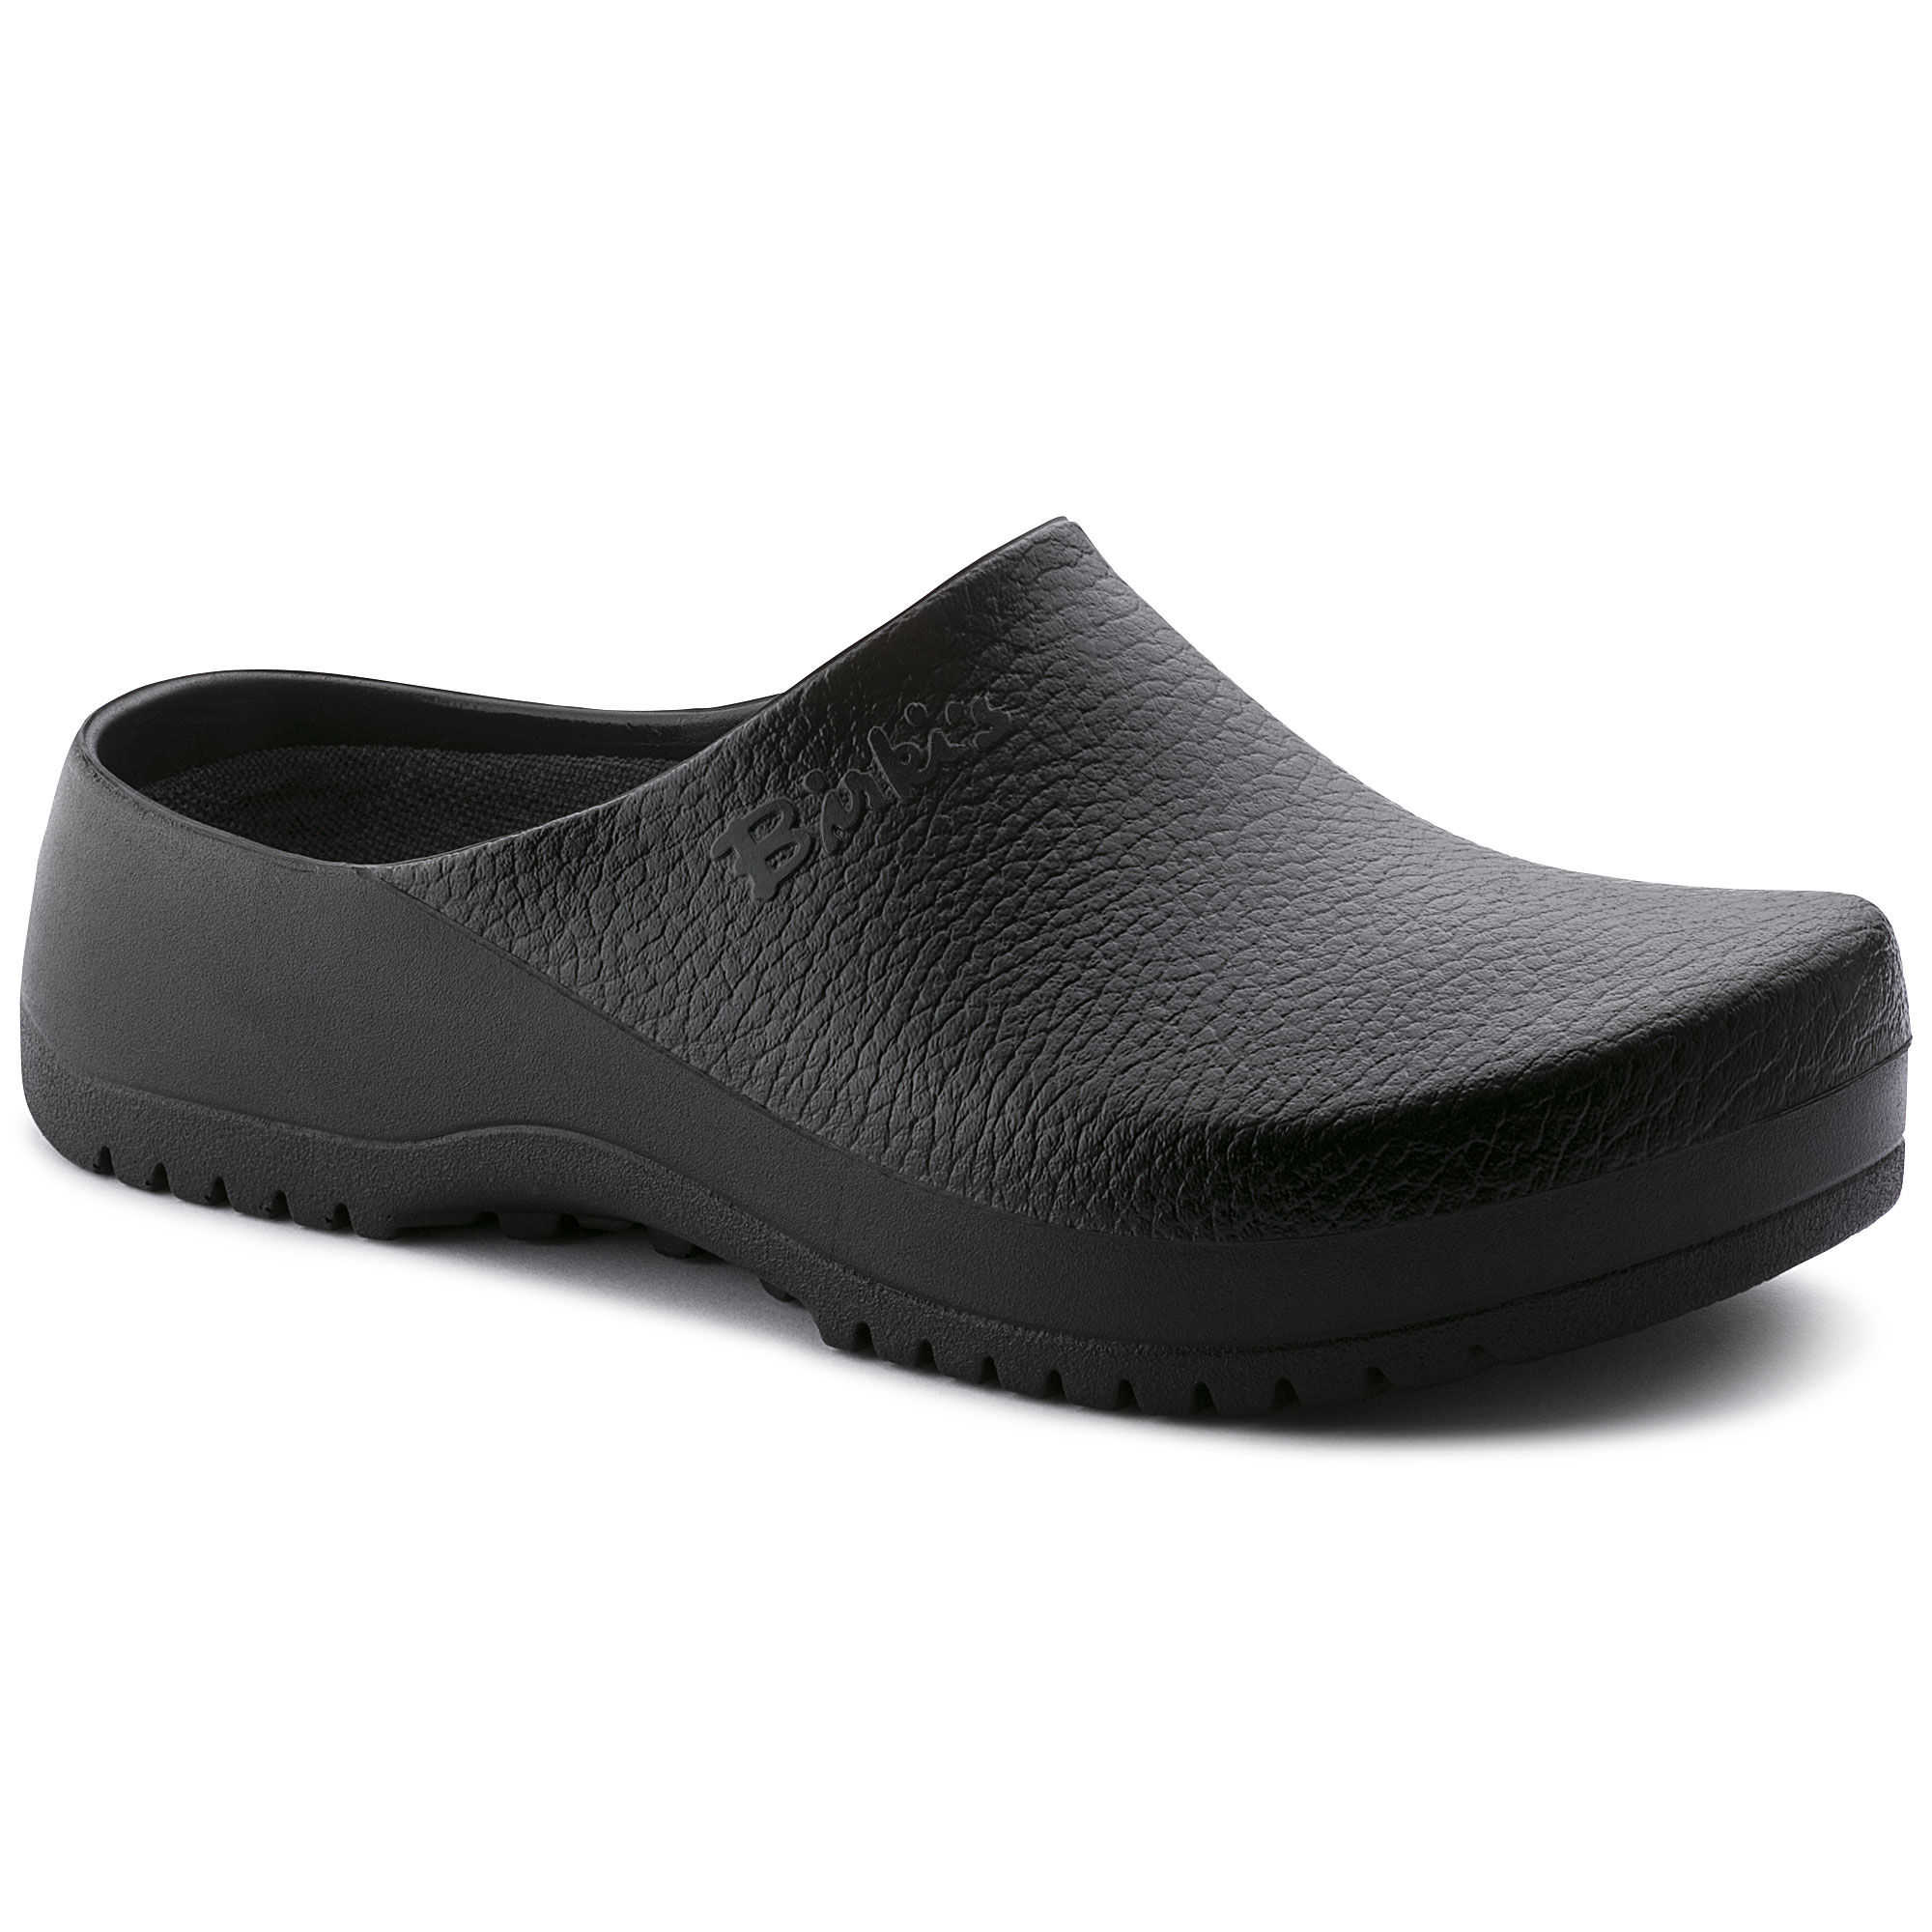 Oline Sandal, Zuecos para Mujer, Negro (Black 2), 38 EU Sanita